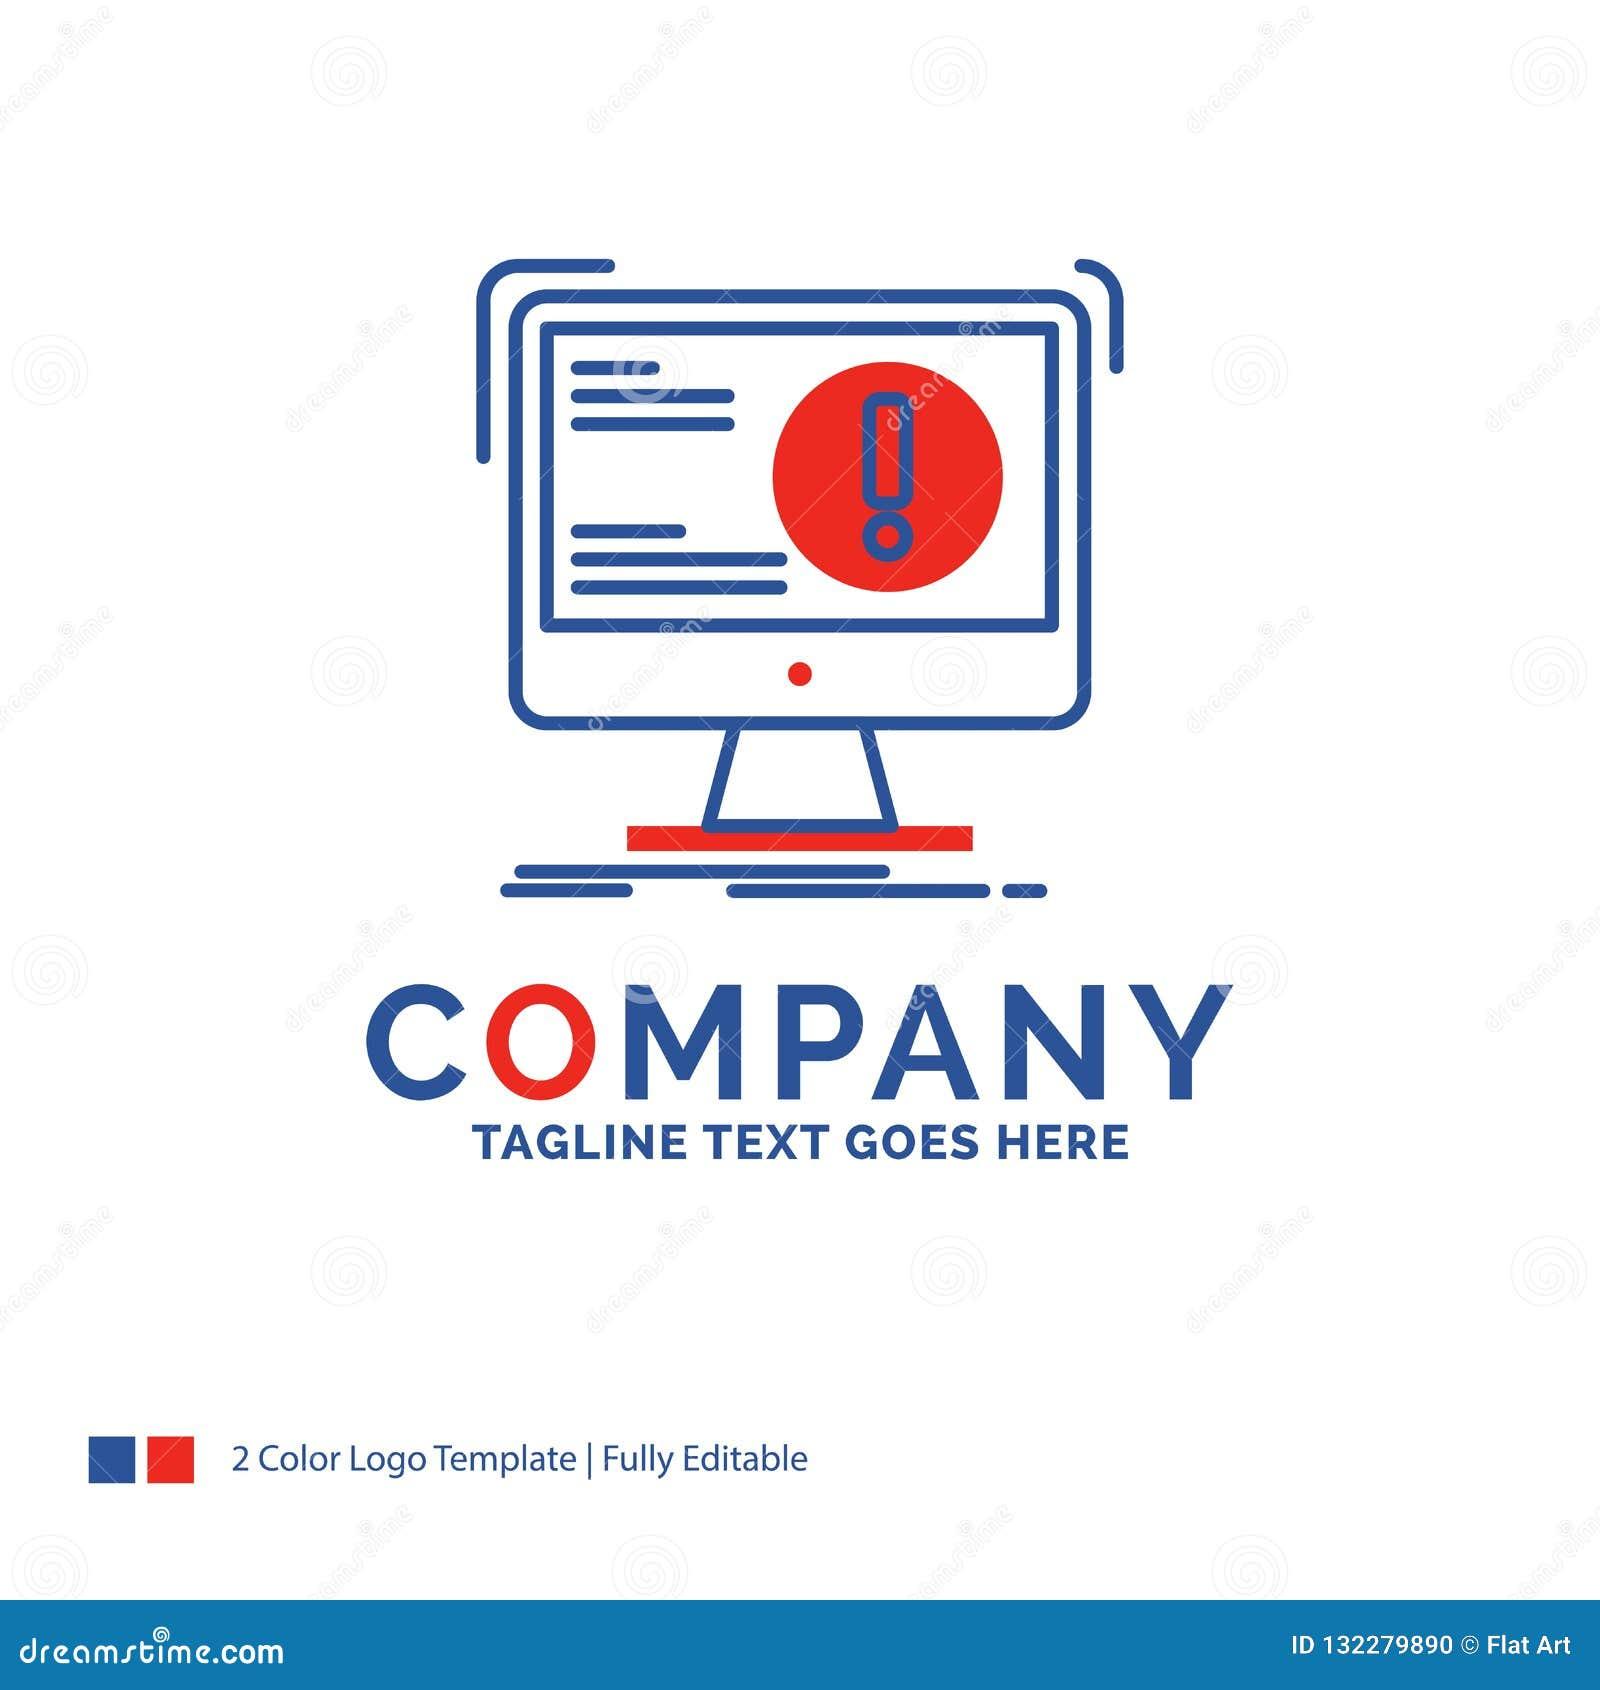 Company Name Logo Design For Alert, Antivirus, Attack